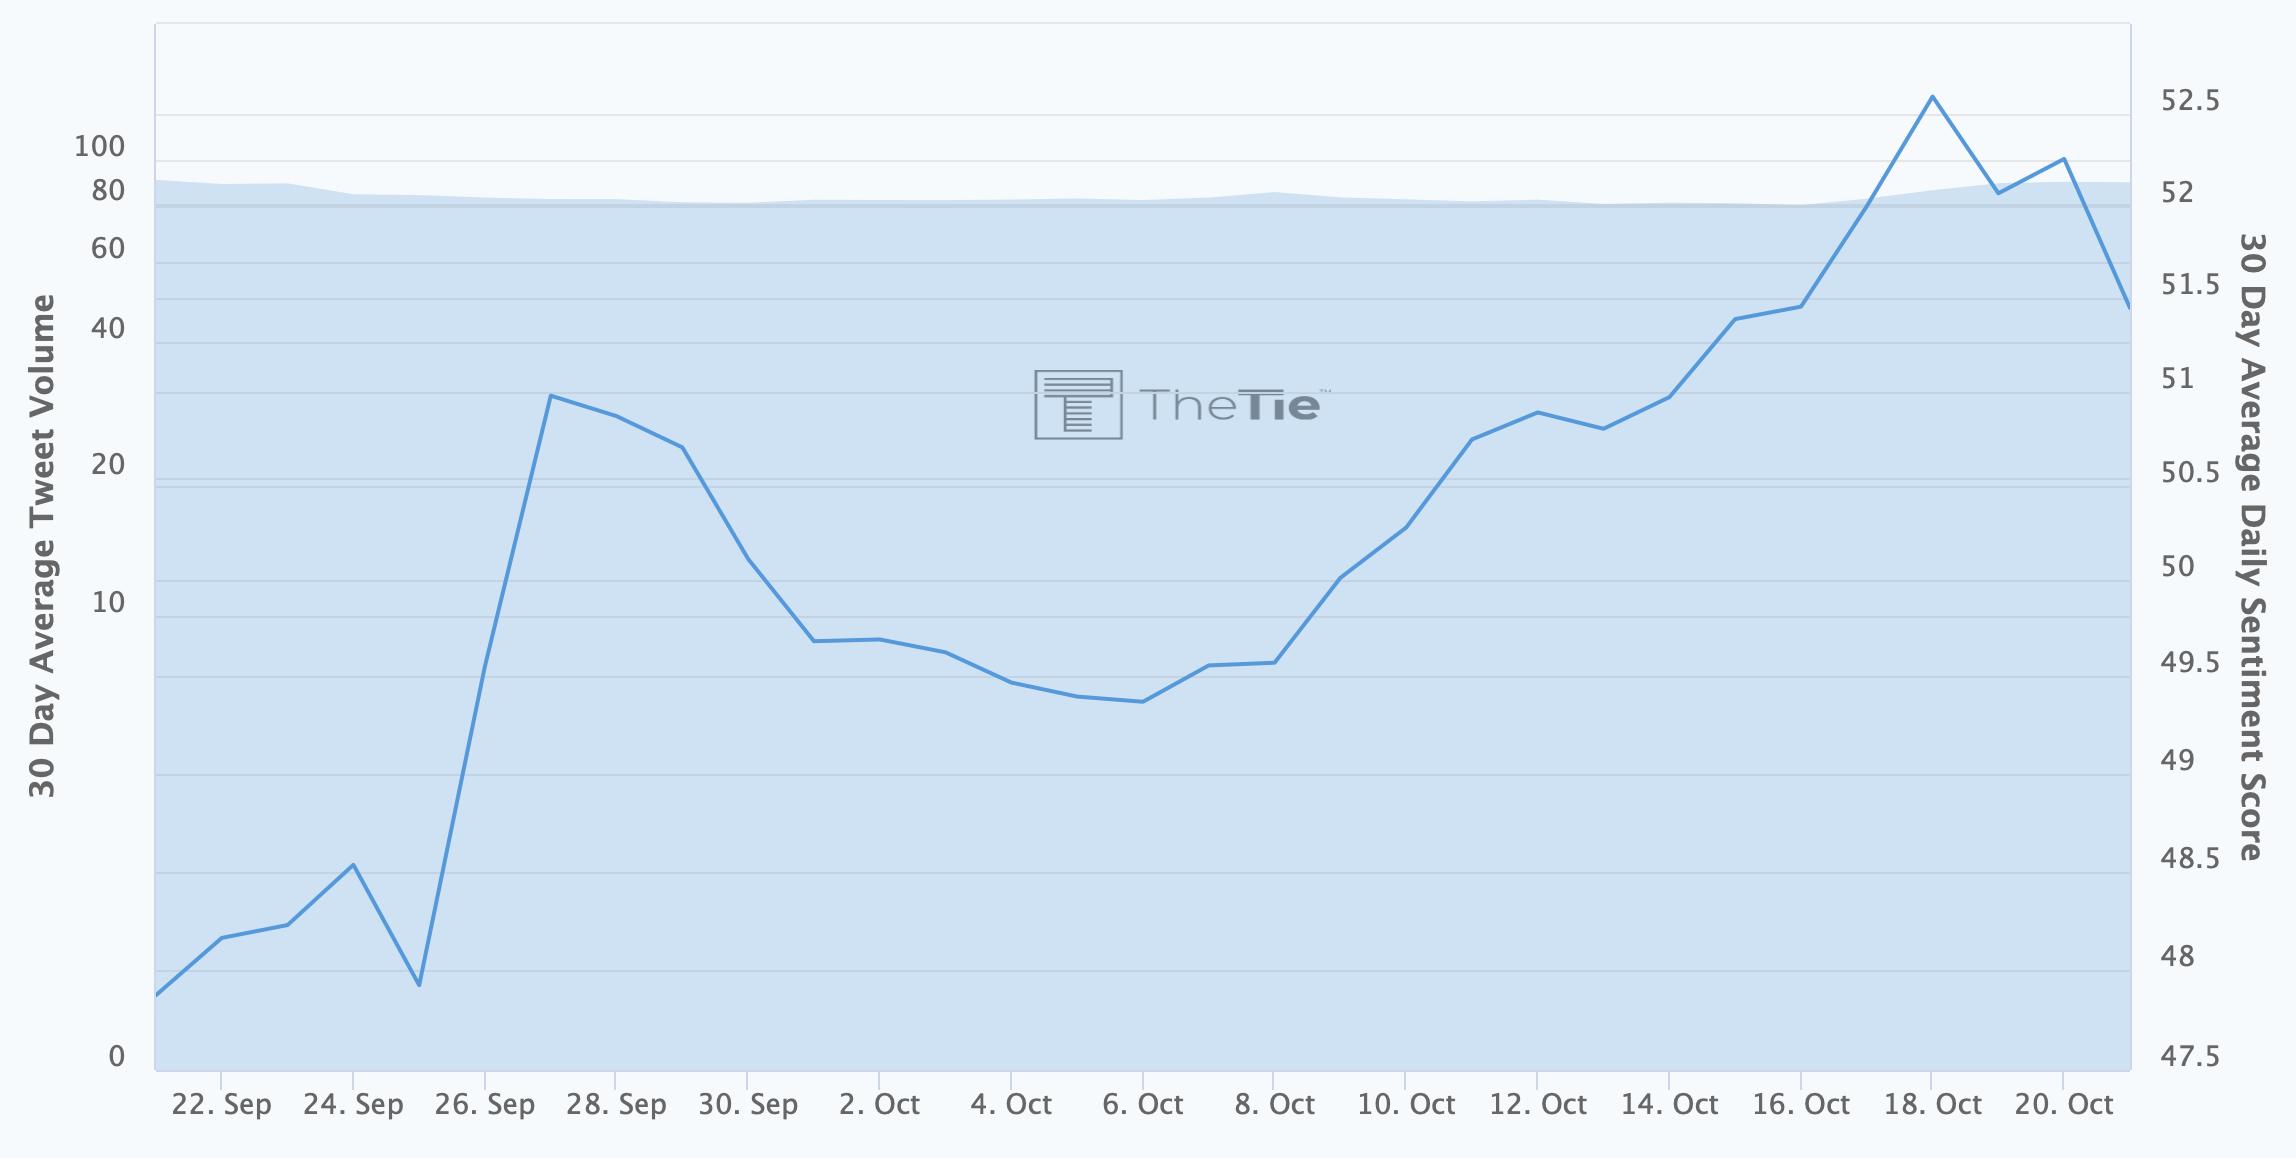 Bitcoin SV sentiment rising